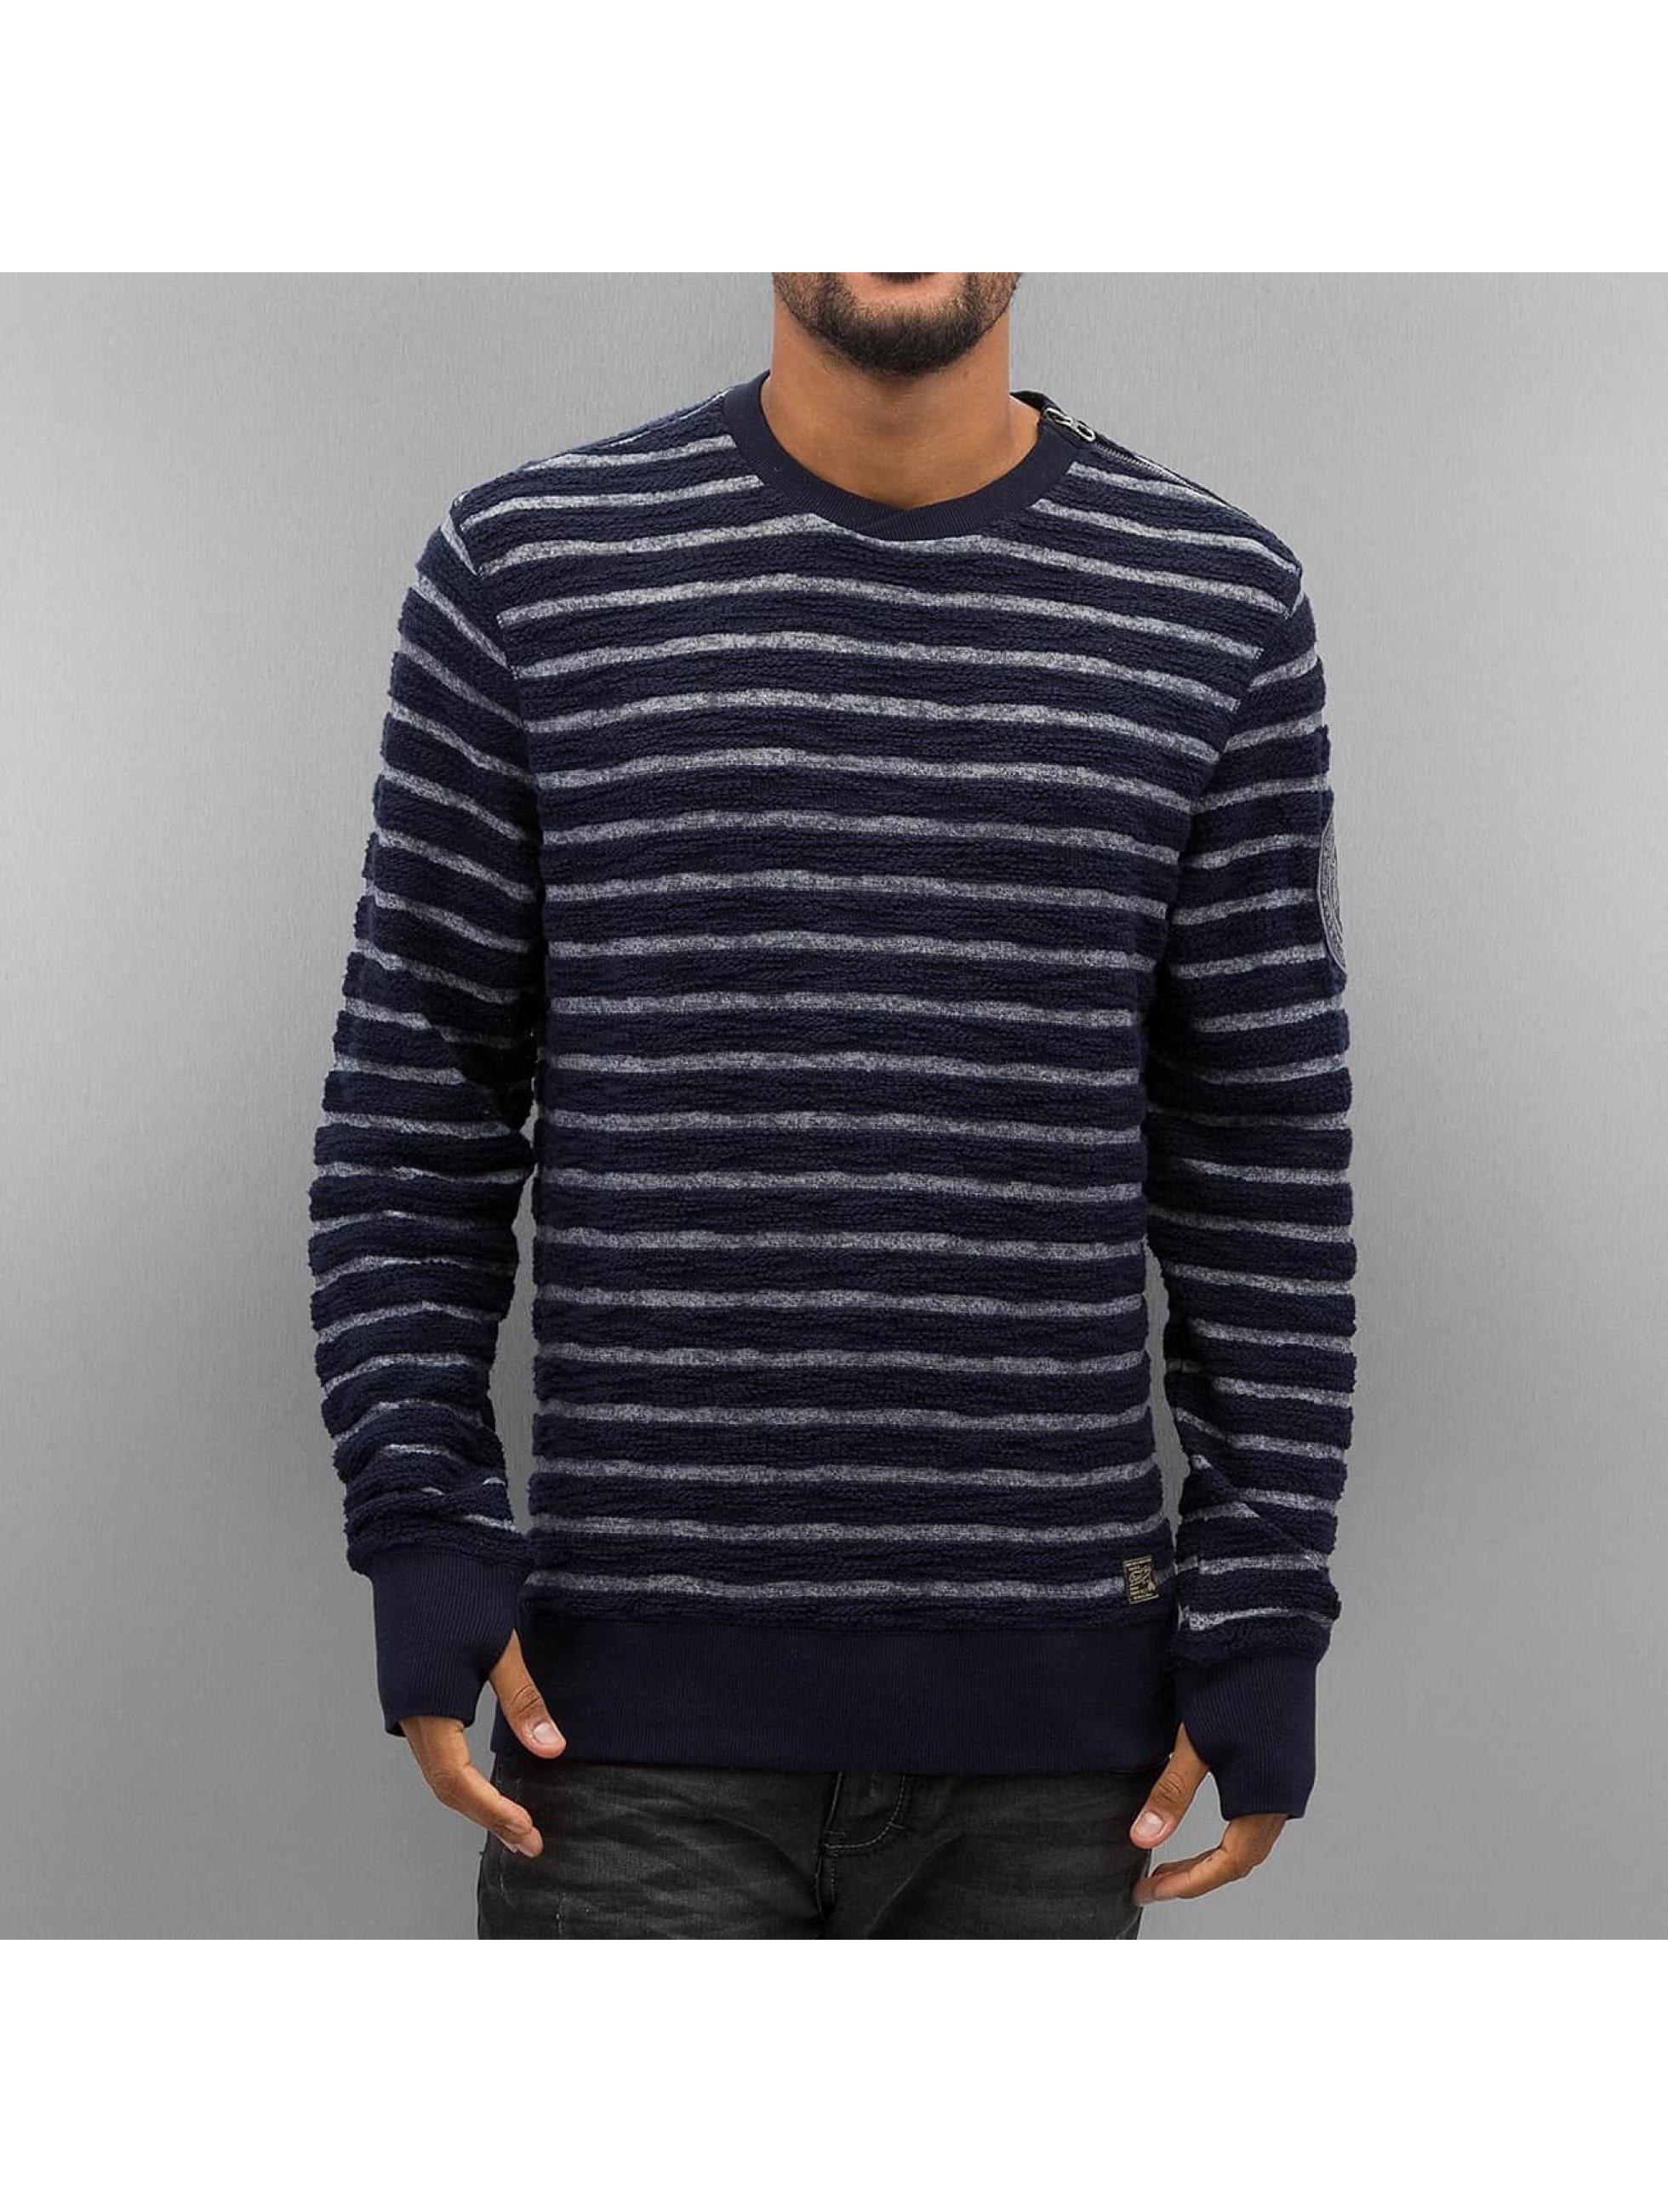 Pullover Stripes in blau